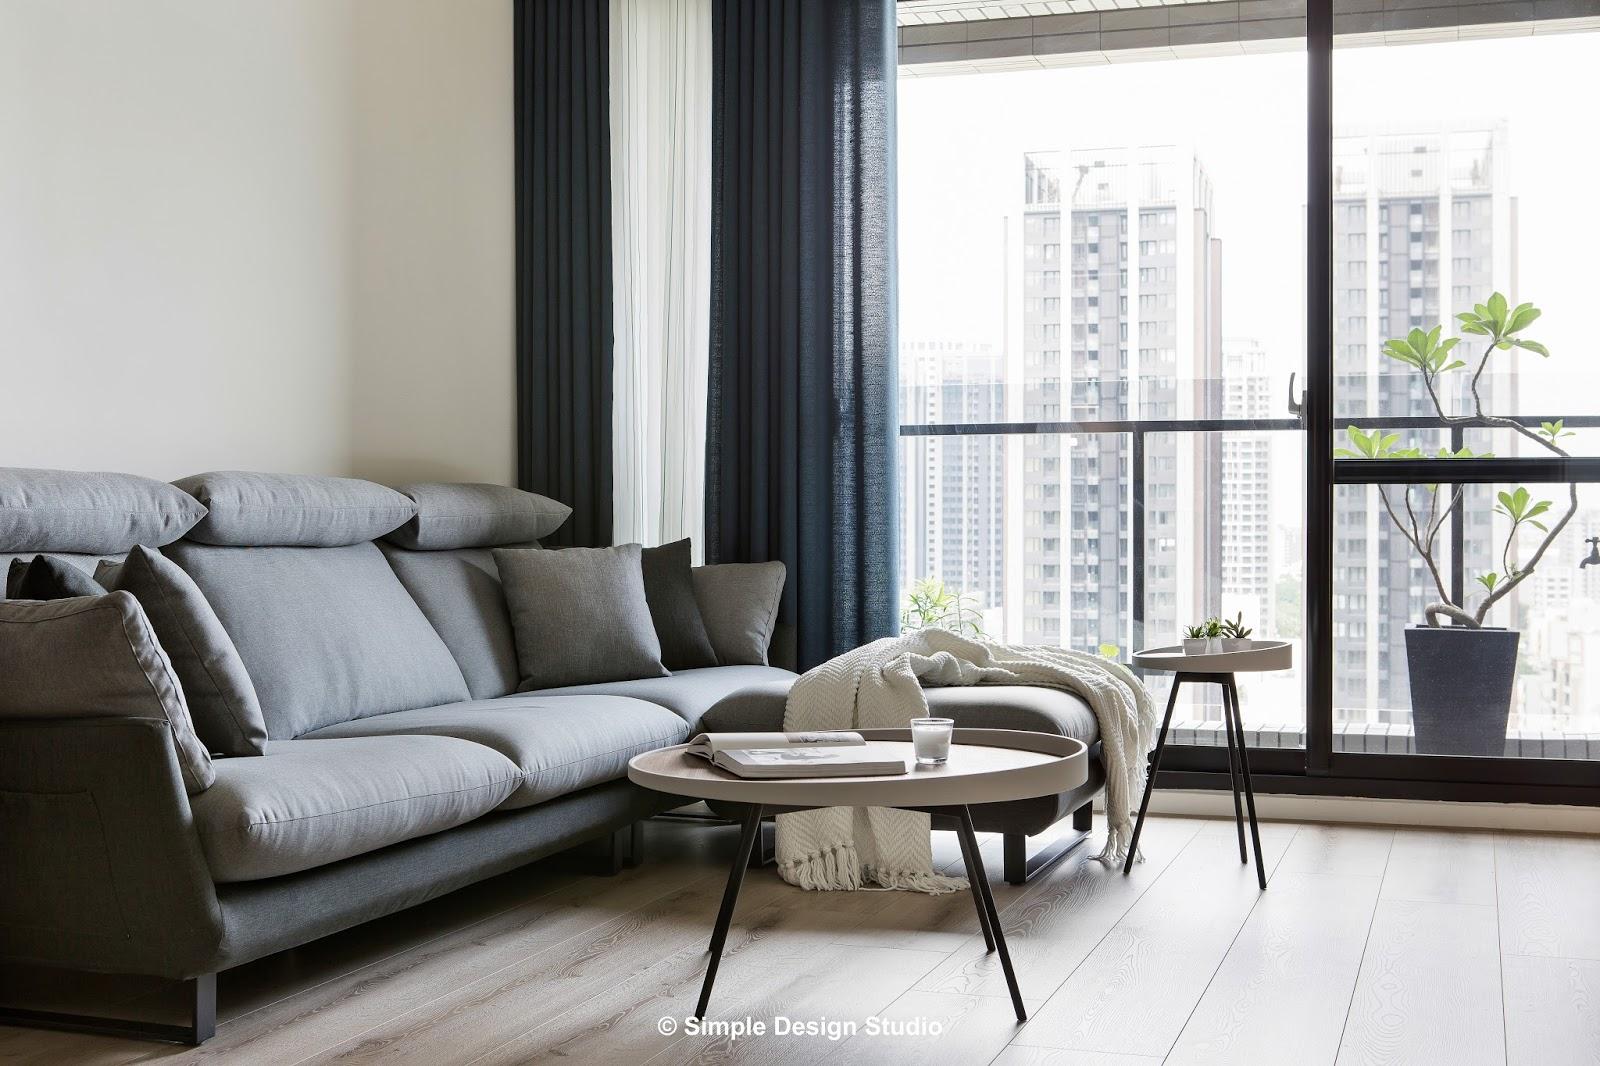 simple design studio simple nihon. Black Bedroom Furniture Sets. Home Design Ideas